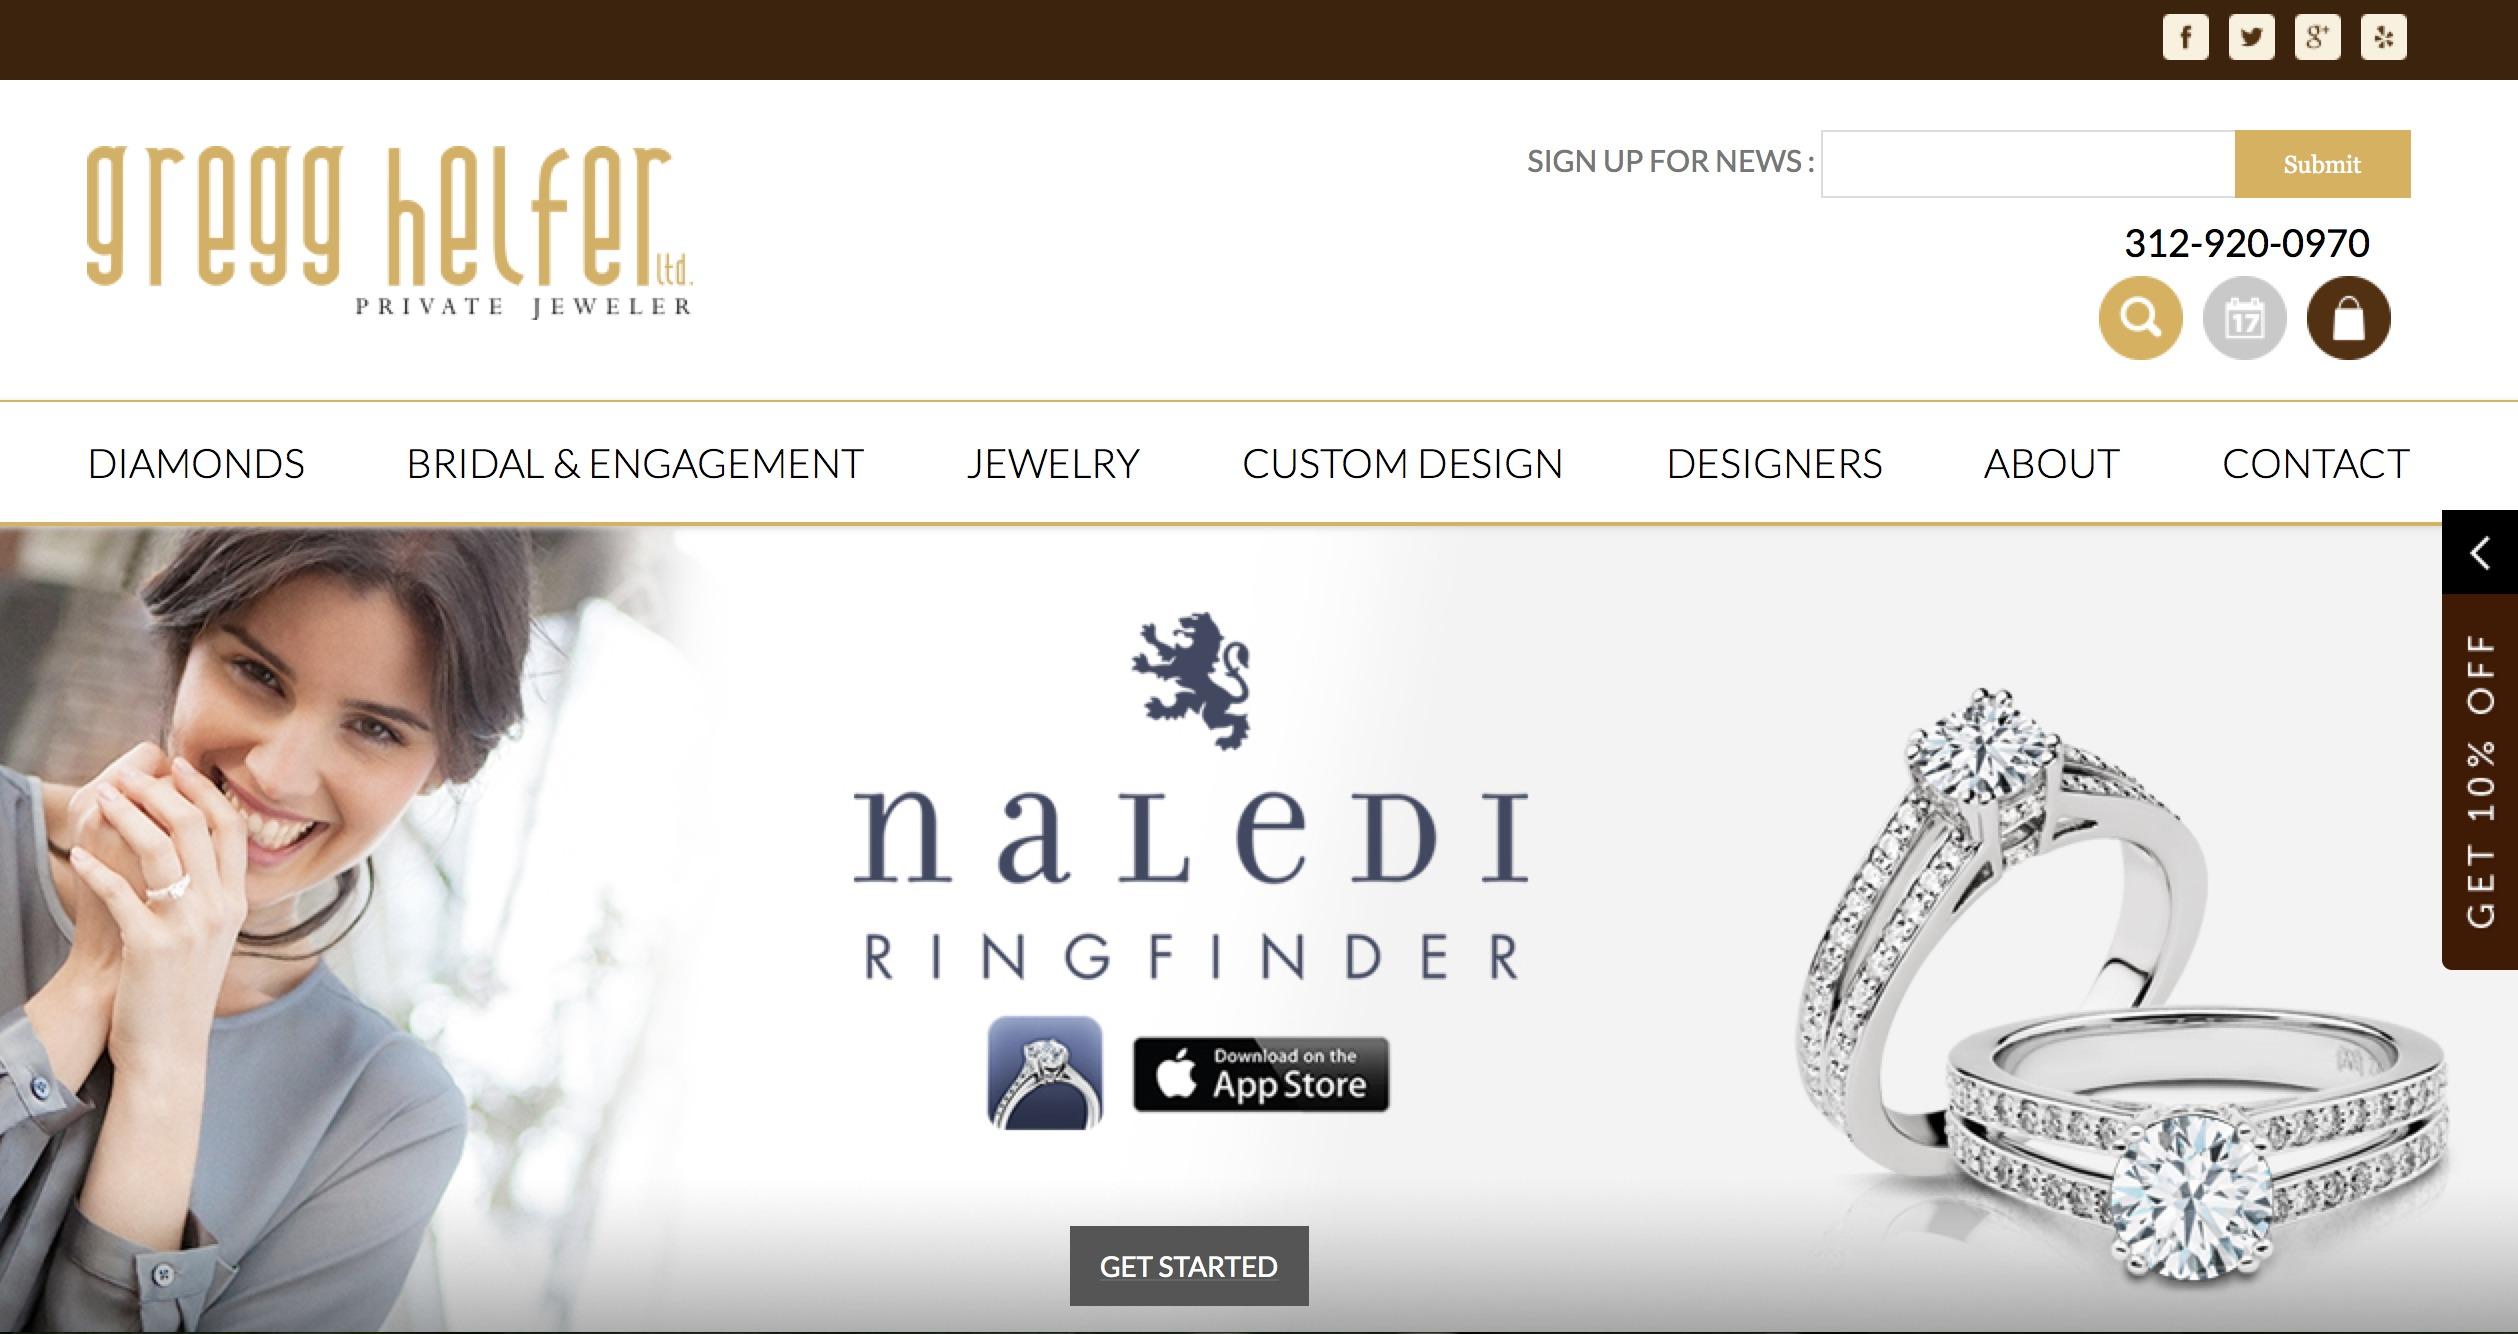 Gemfind Launches Website For Chicago Jeweler Gregg Helfer,Creative Vector Graphic Designer Visiting Card Design